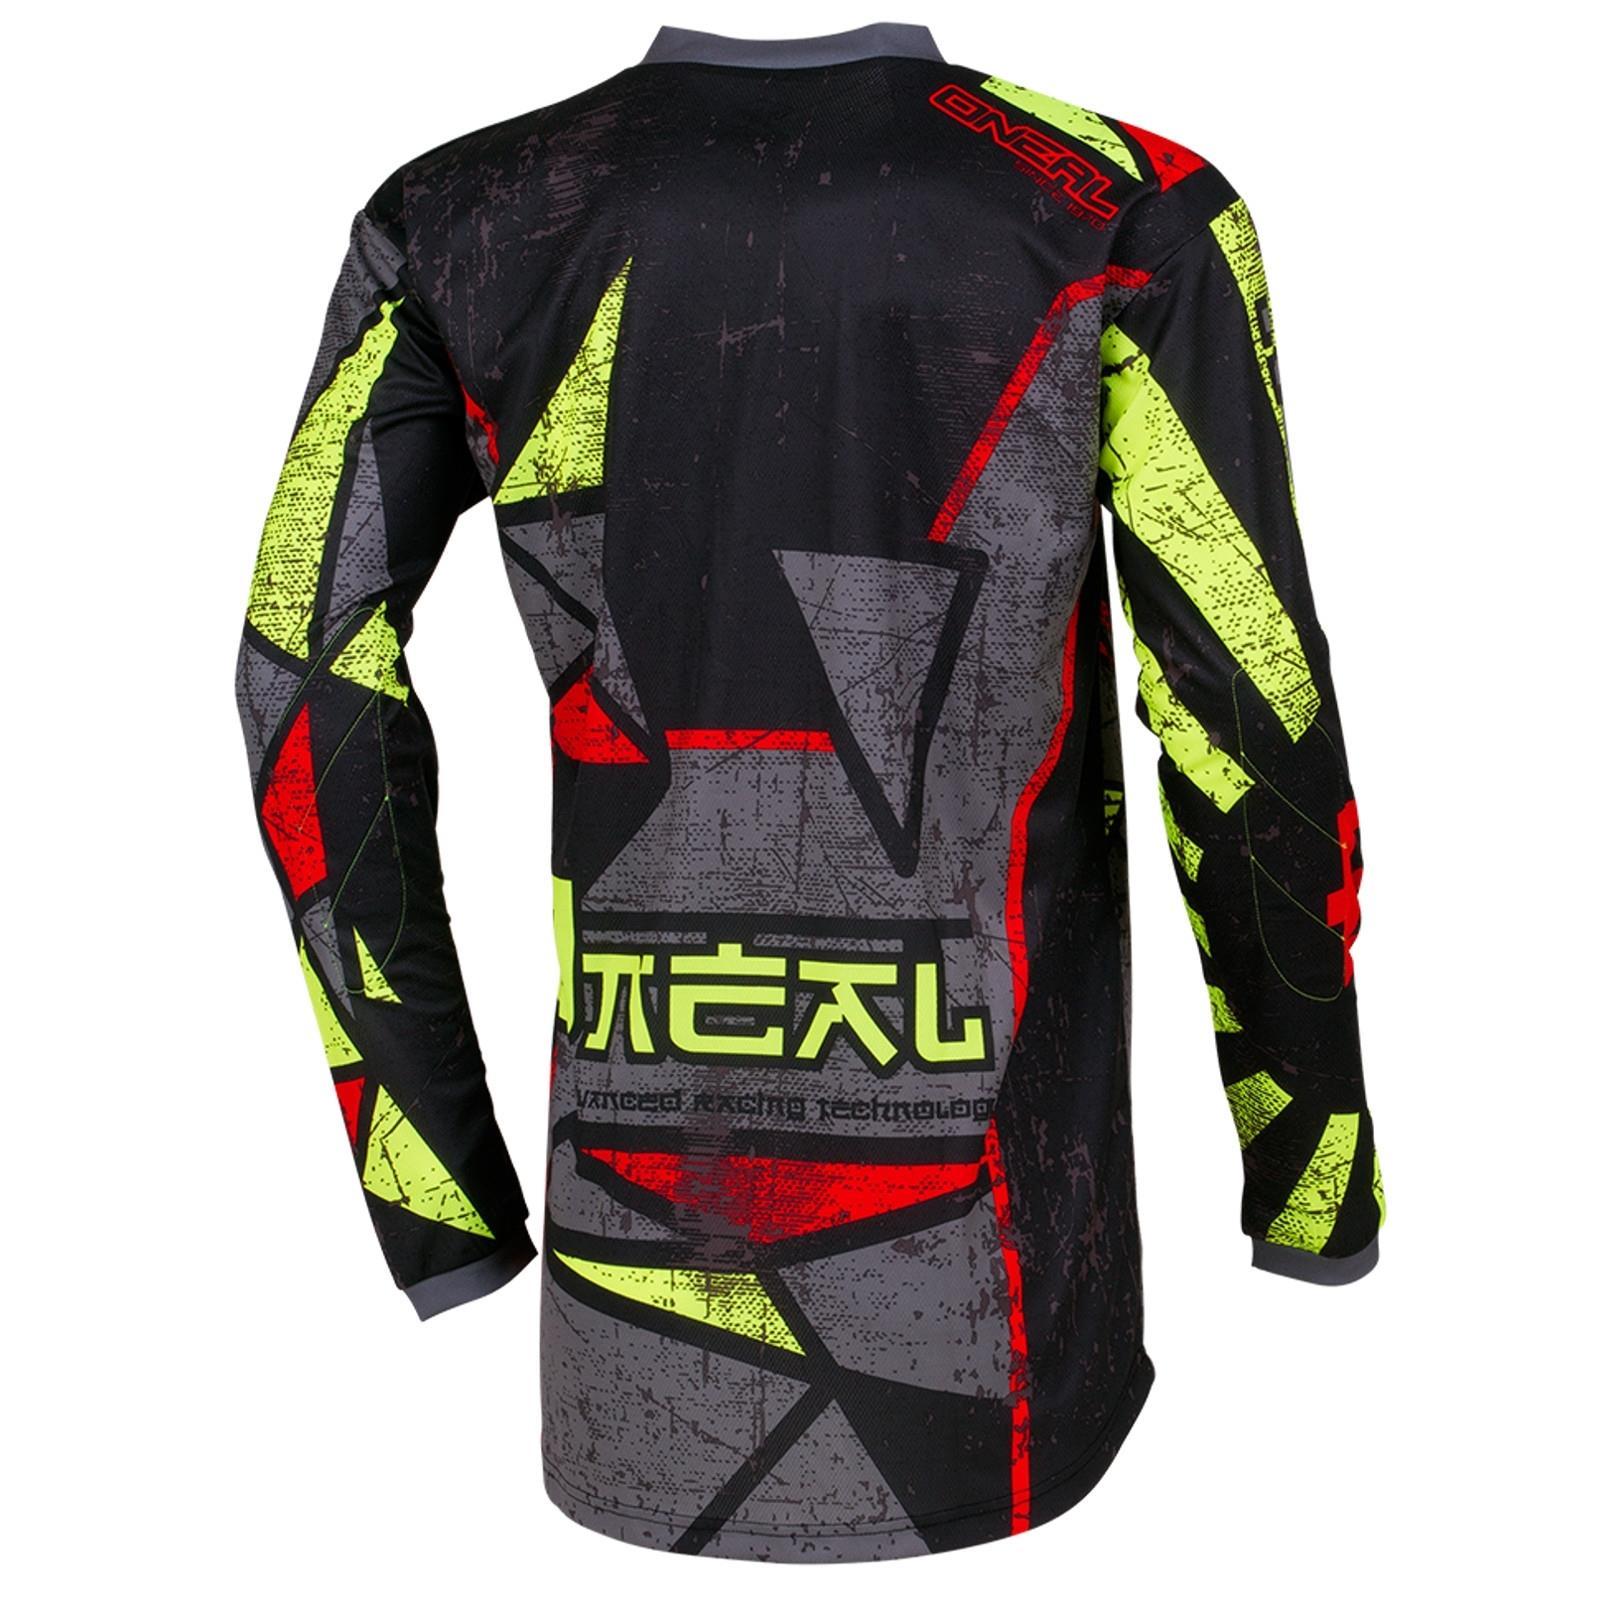 O-039-Neal-elemento-Mayhem-JERSEY-Racewear-Motocross-Maglia-MX-DH-FR-MTB-MOUNTAIN-BIKE miniatura 42